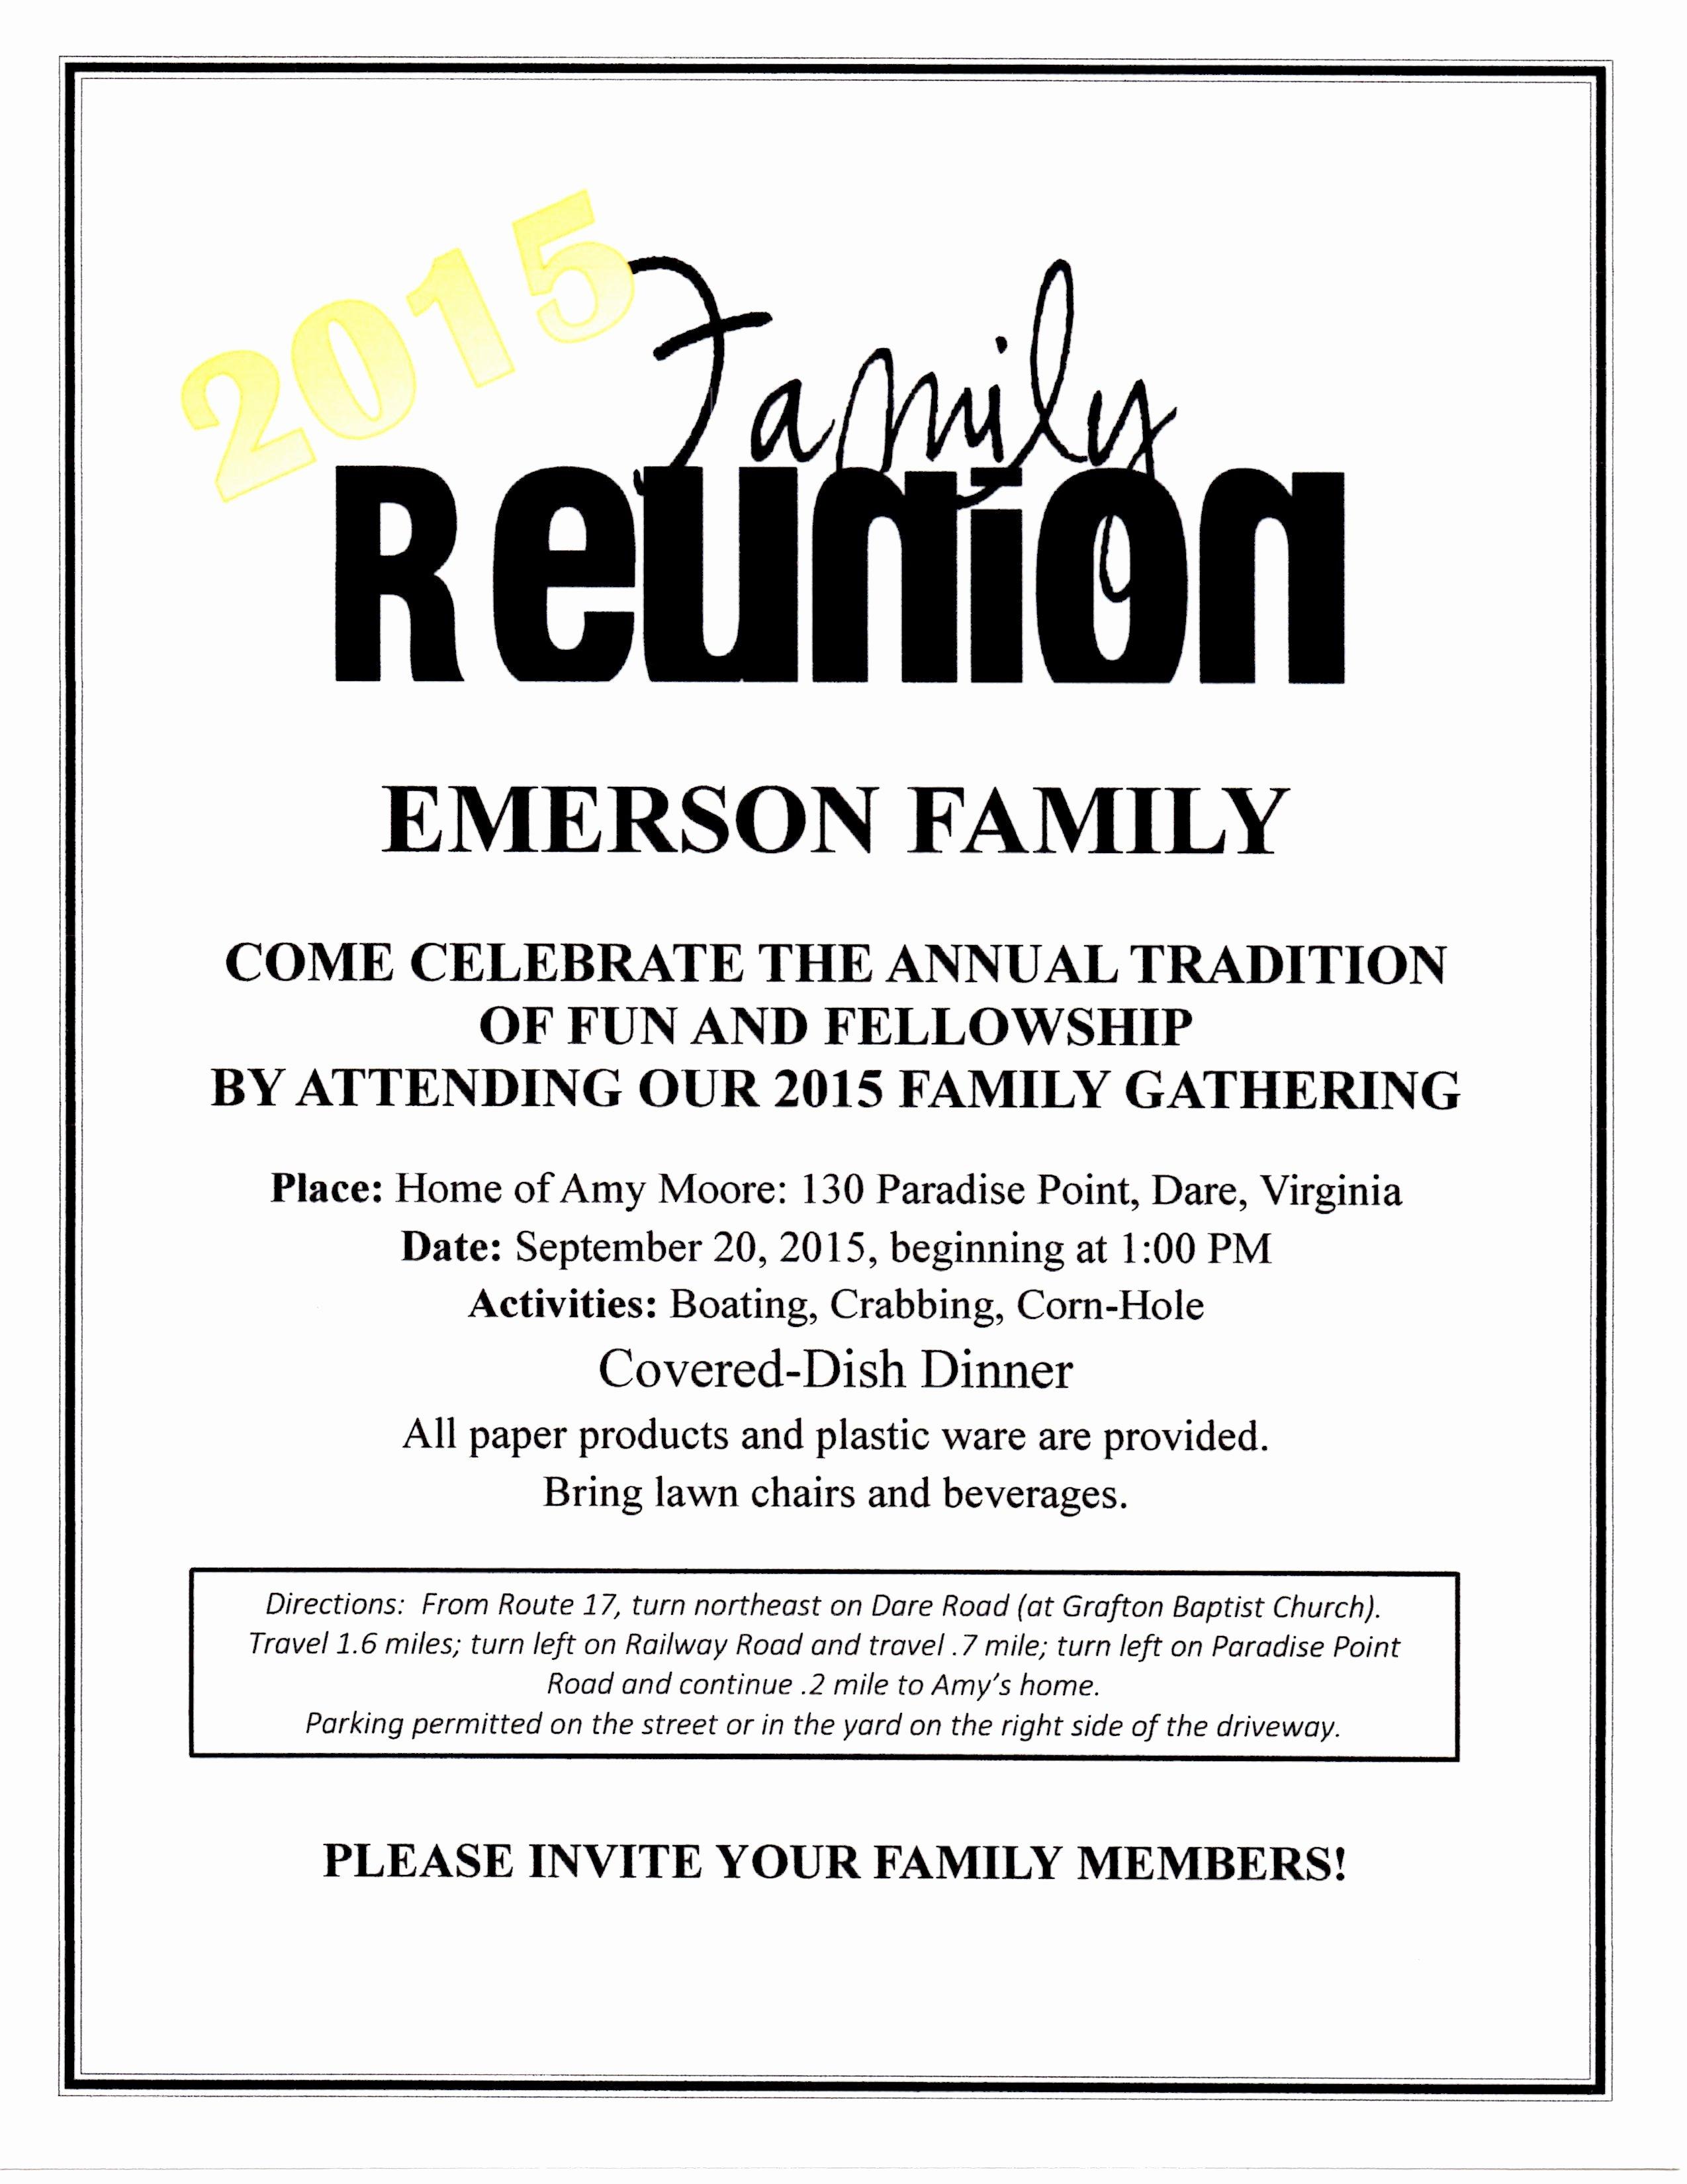 Family Reunion Flyer Templates Unique Family Reunion Flyer – Tinman Designs Family Reunion